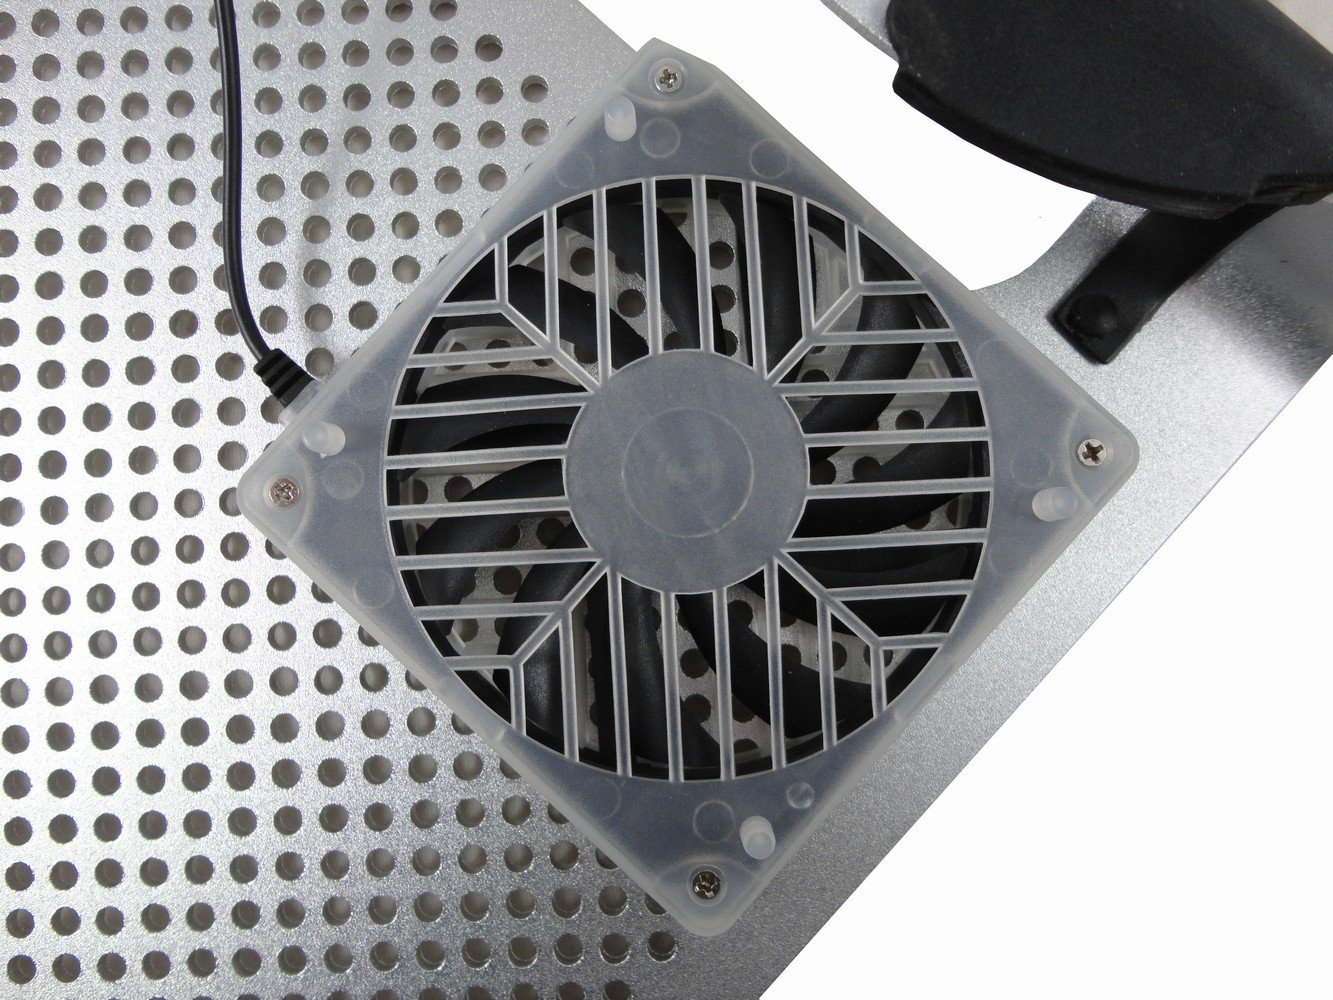 Amazon.com: Fellowes Precision Cooler Laptop Riser: Computers & Accessories